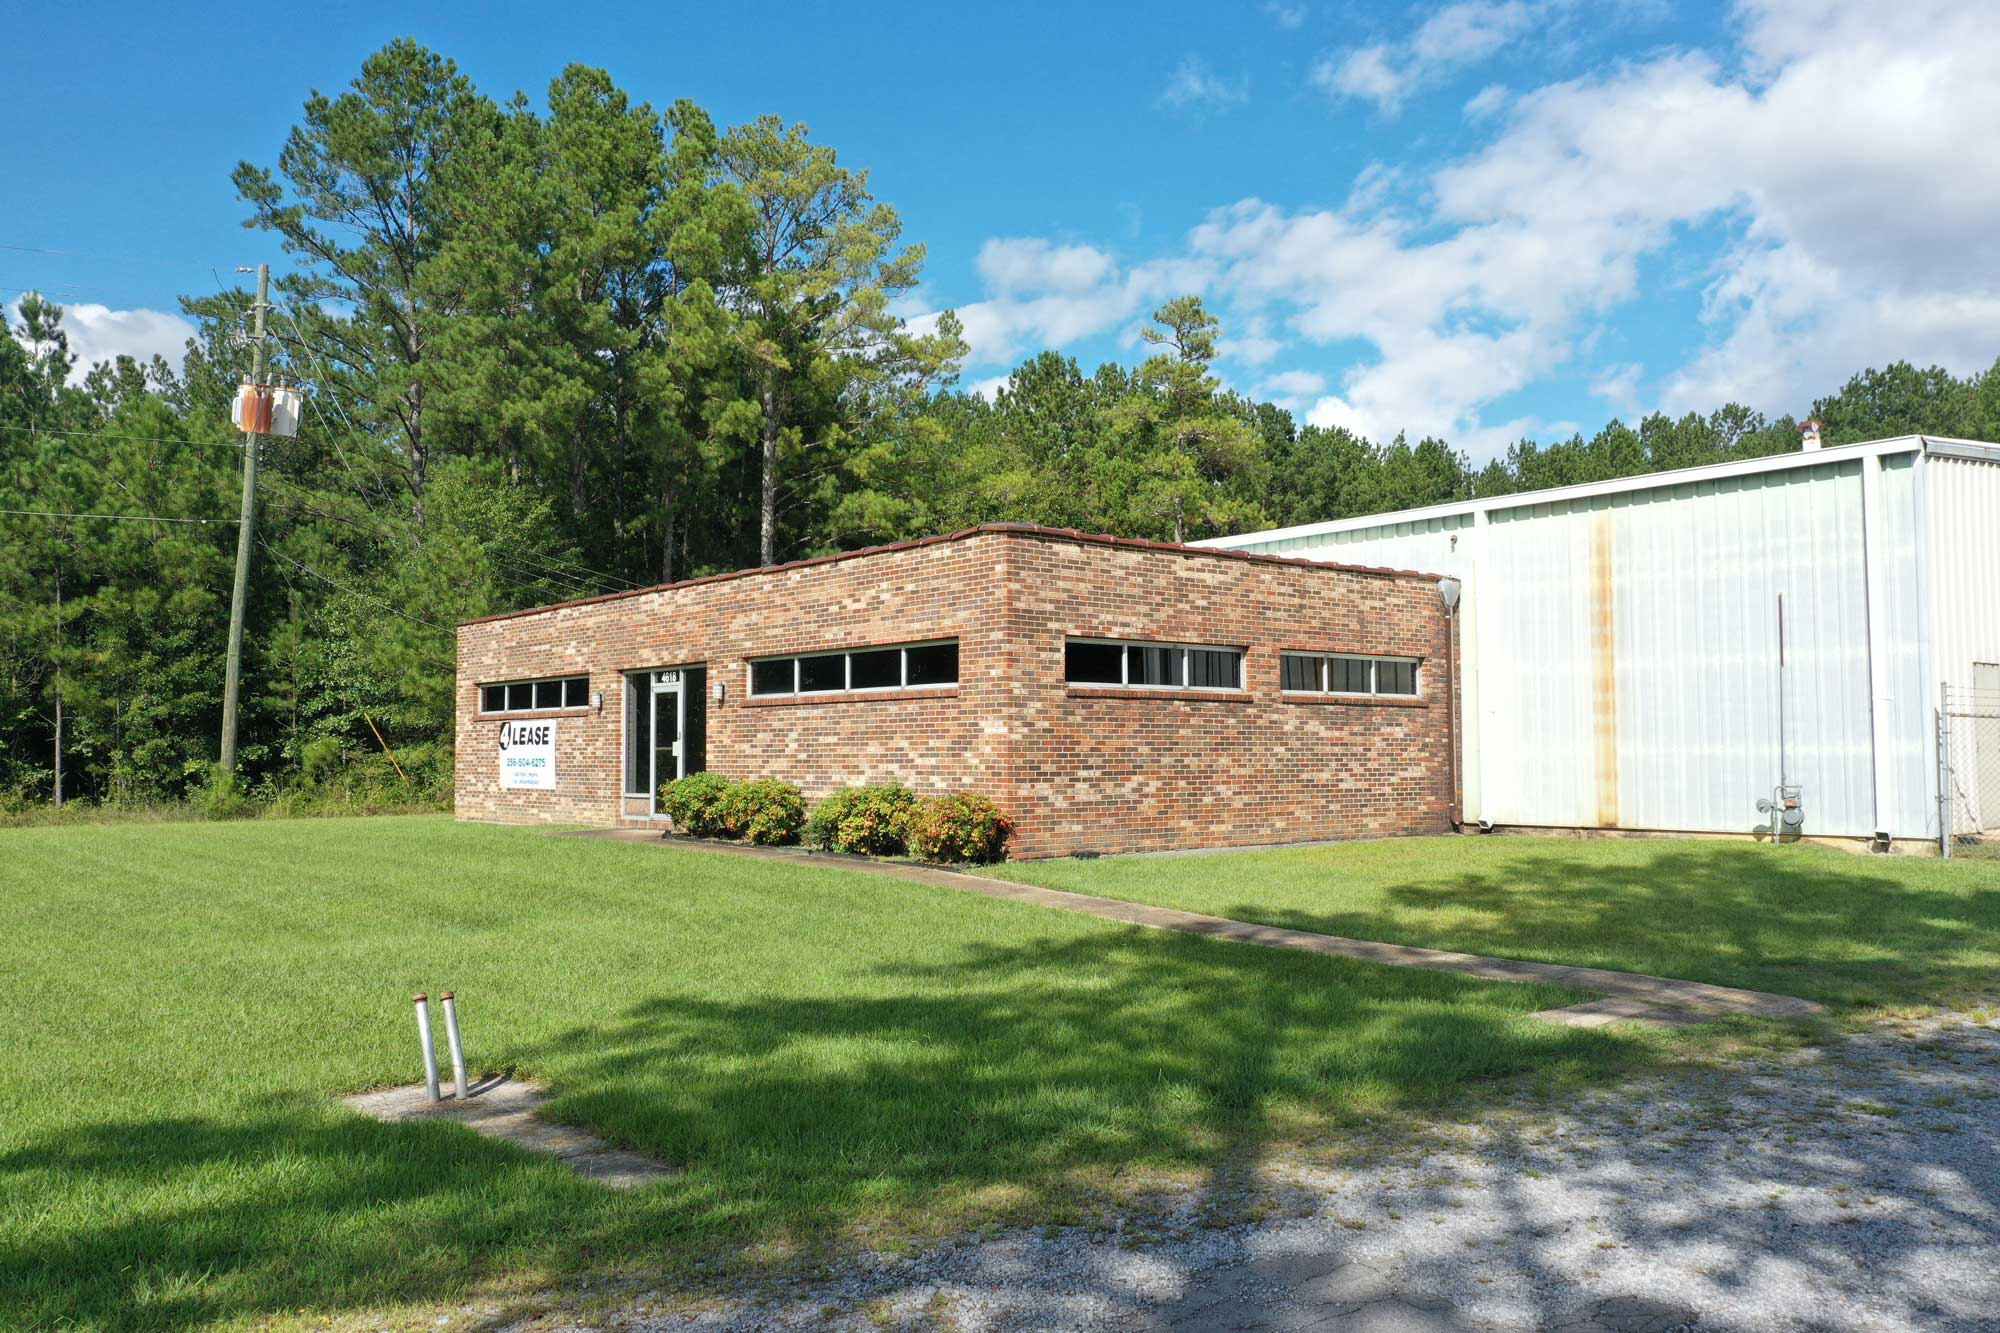 Weaver Building